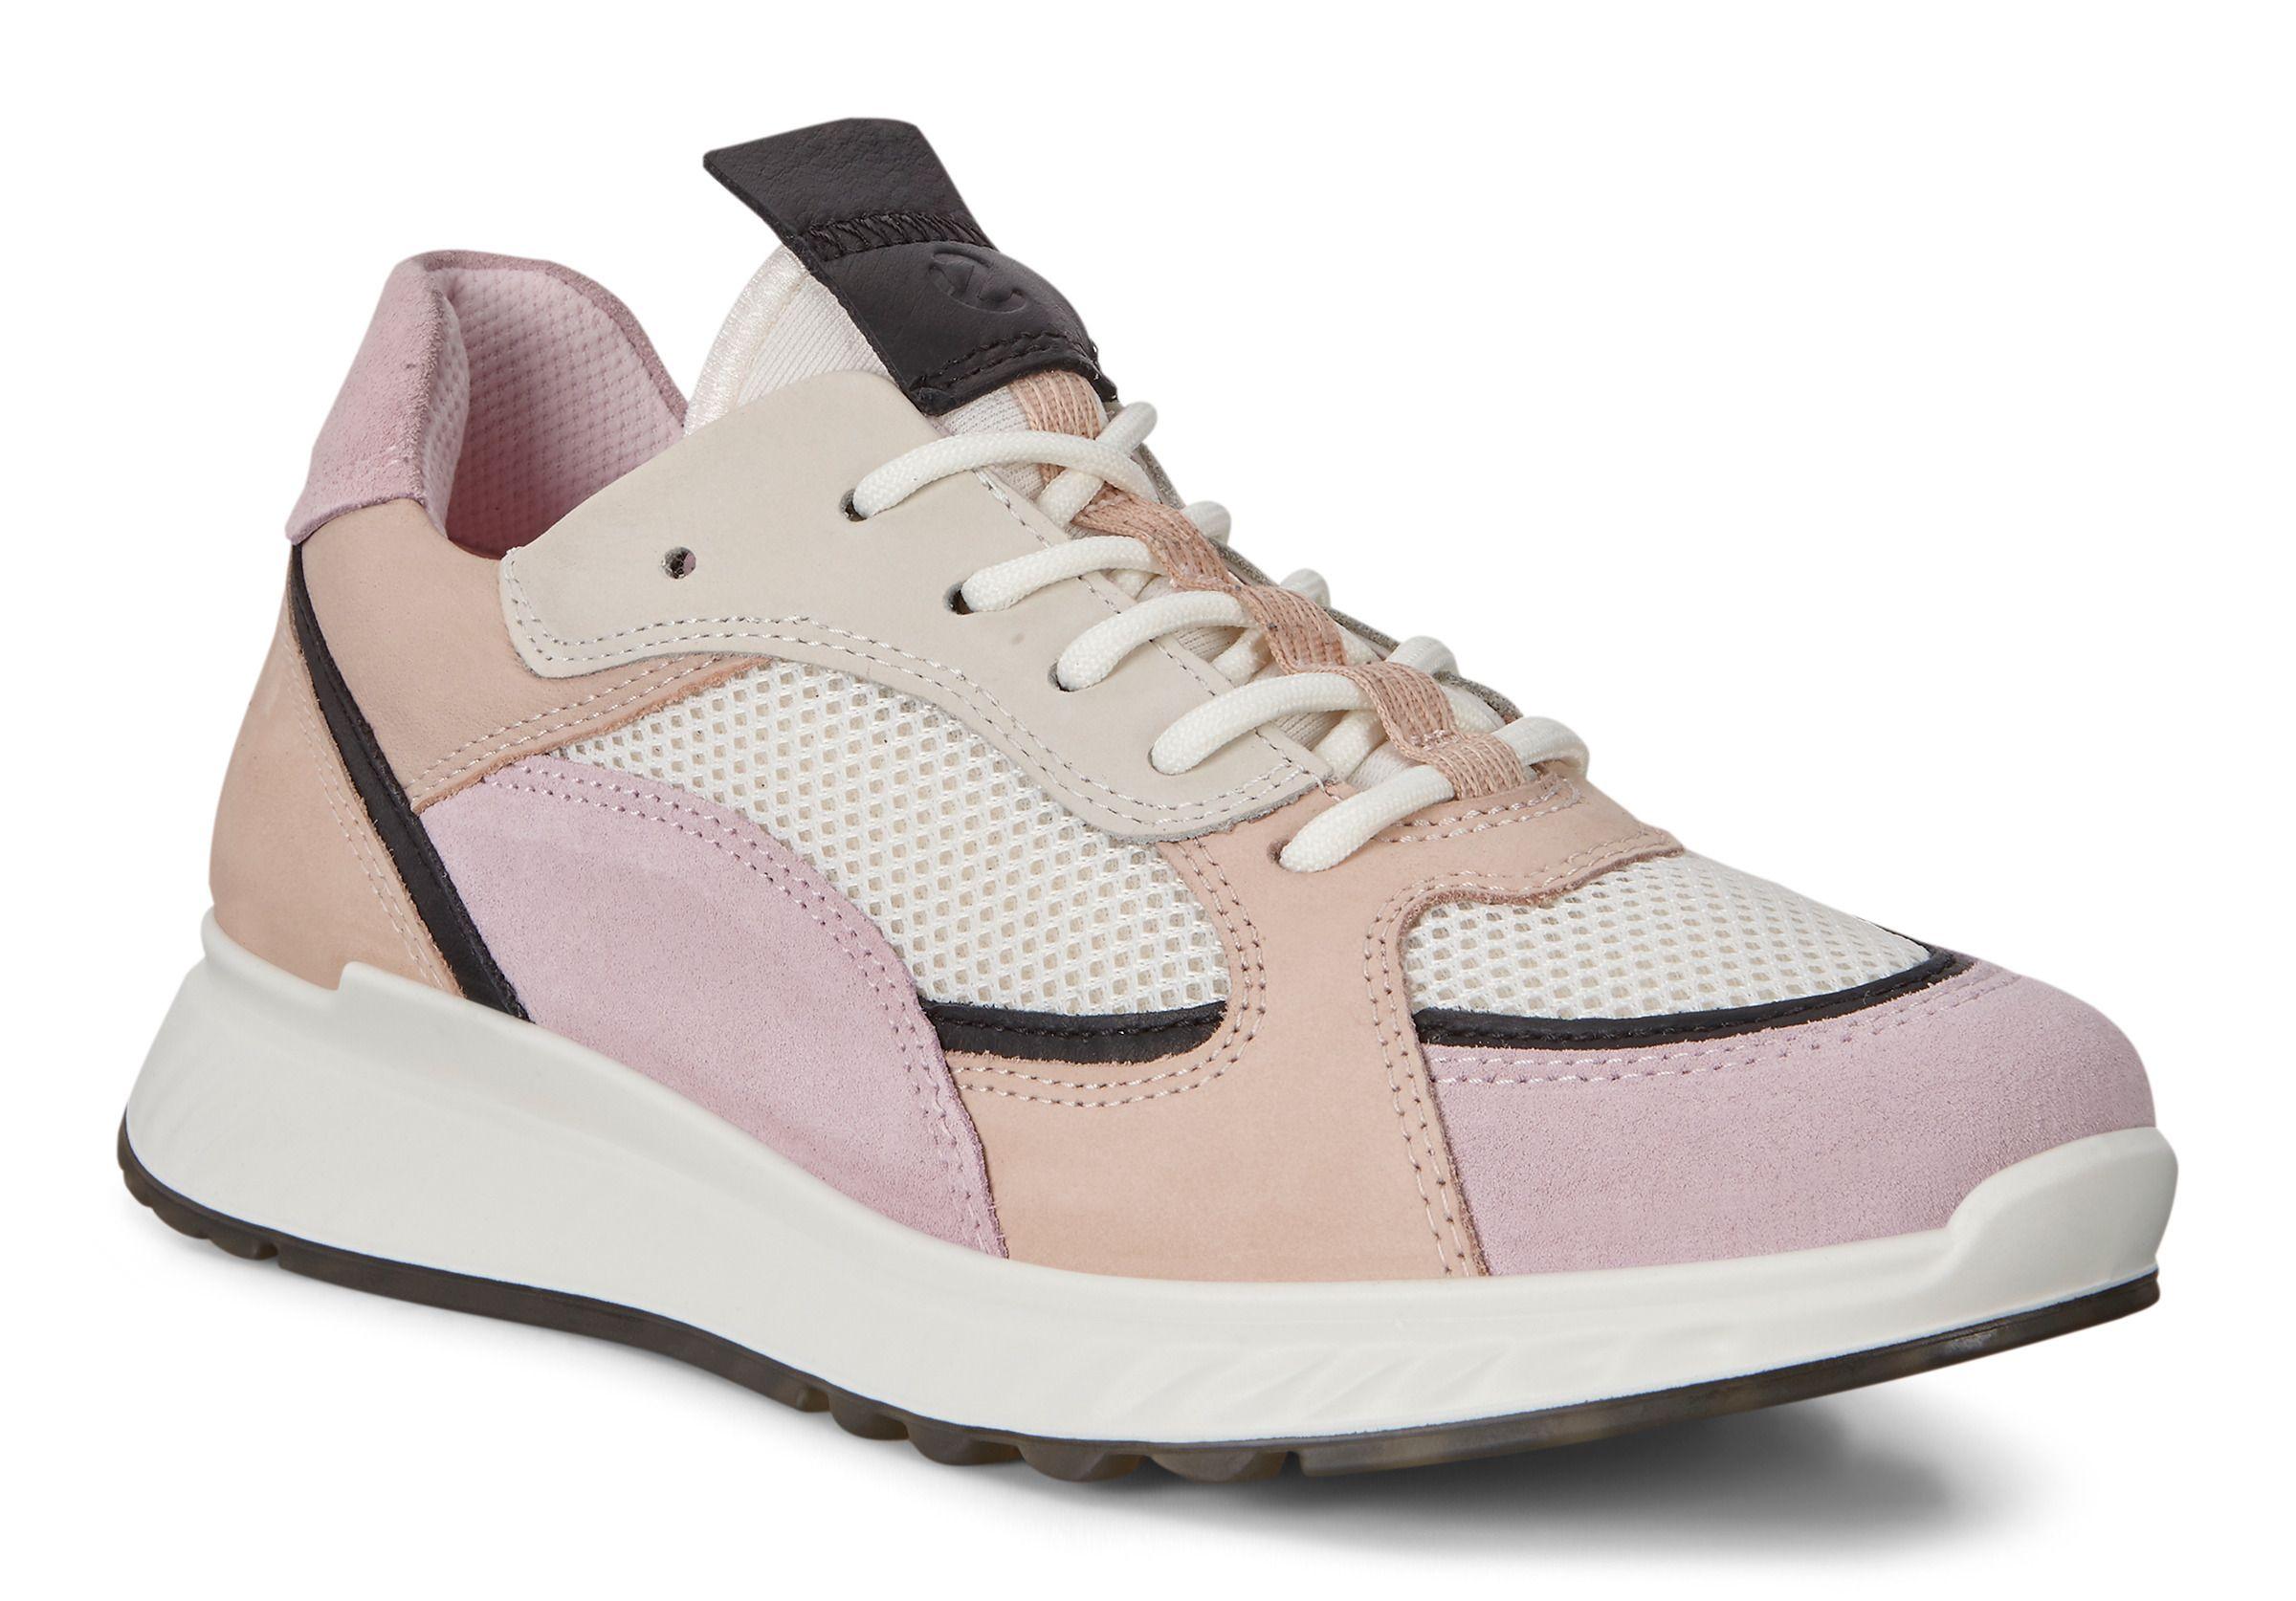 ECCO Soft 7 W Rózsaszín Tornacipő Női